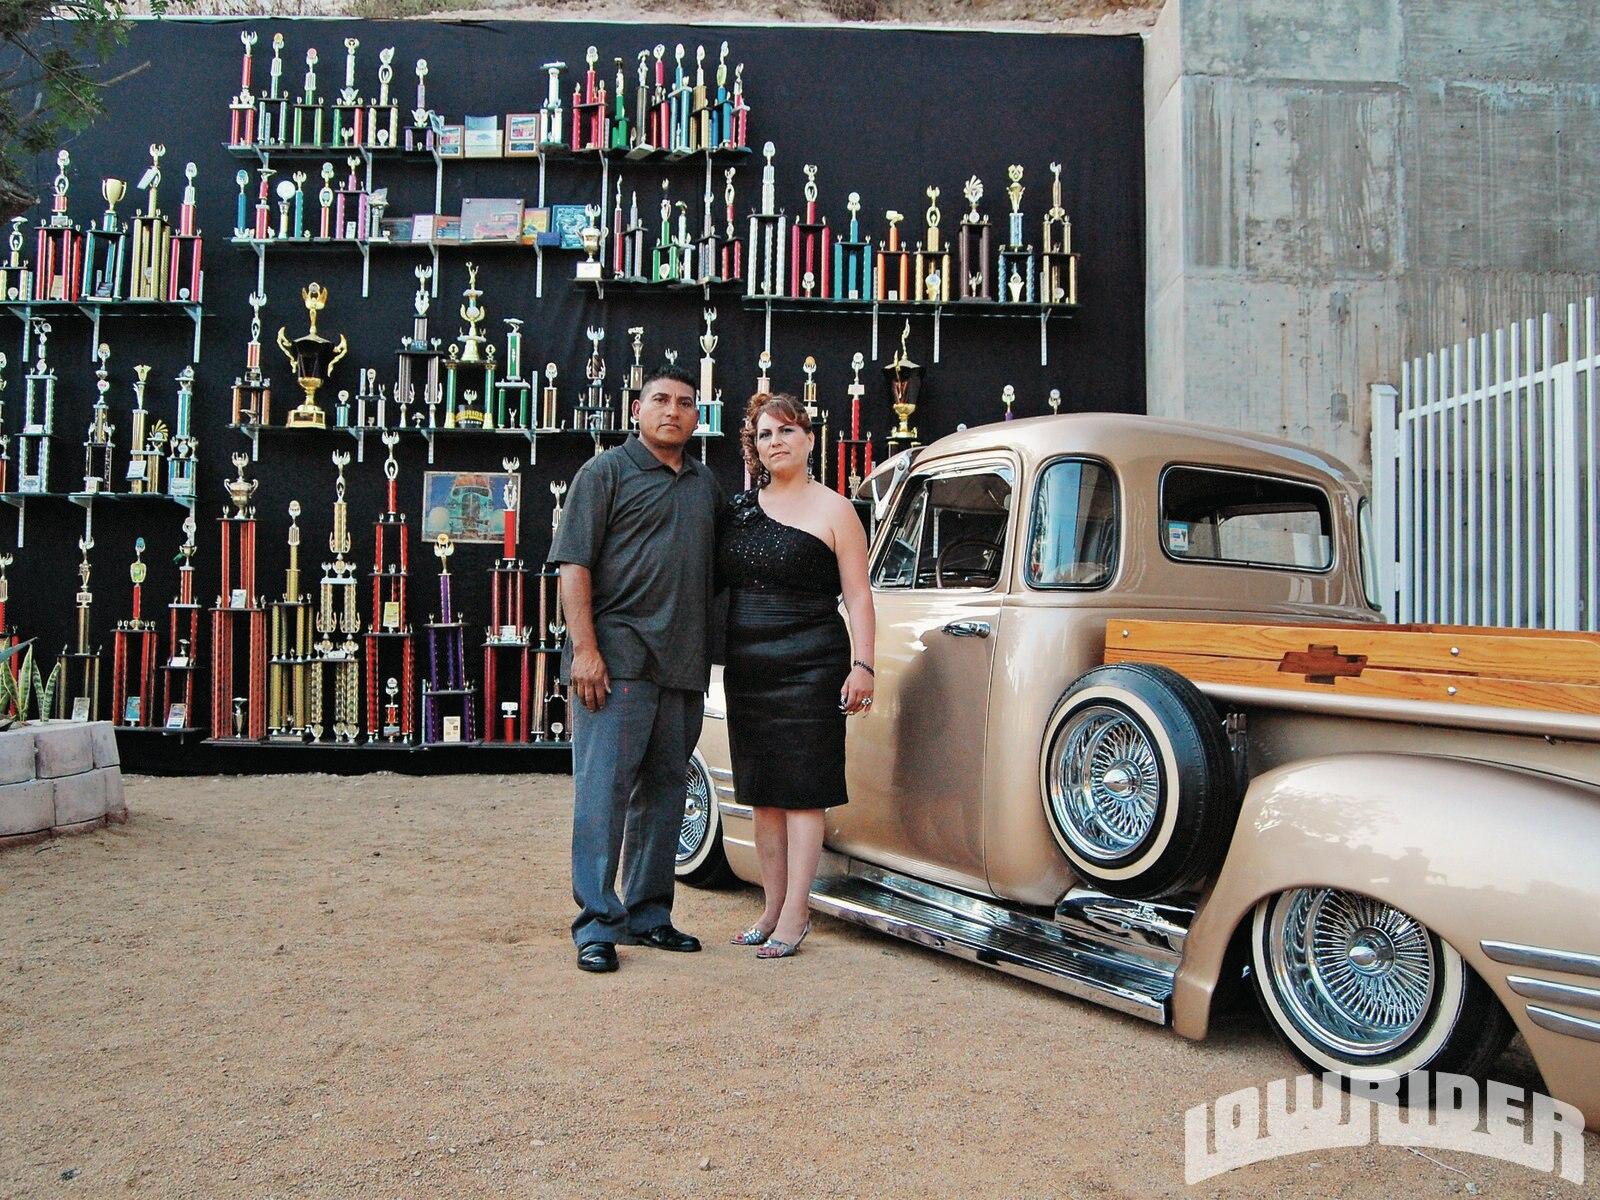 1304-lrmp-05-o-chevy-truck-100-trophies-jesus-contreras